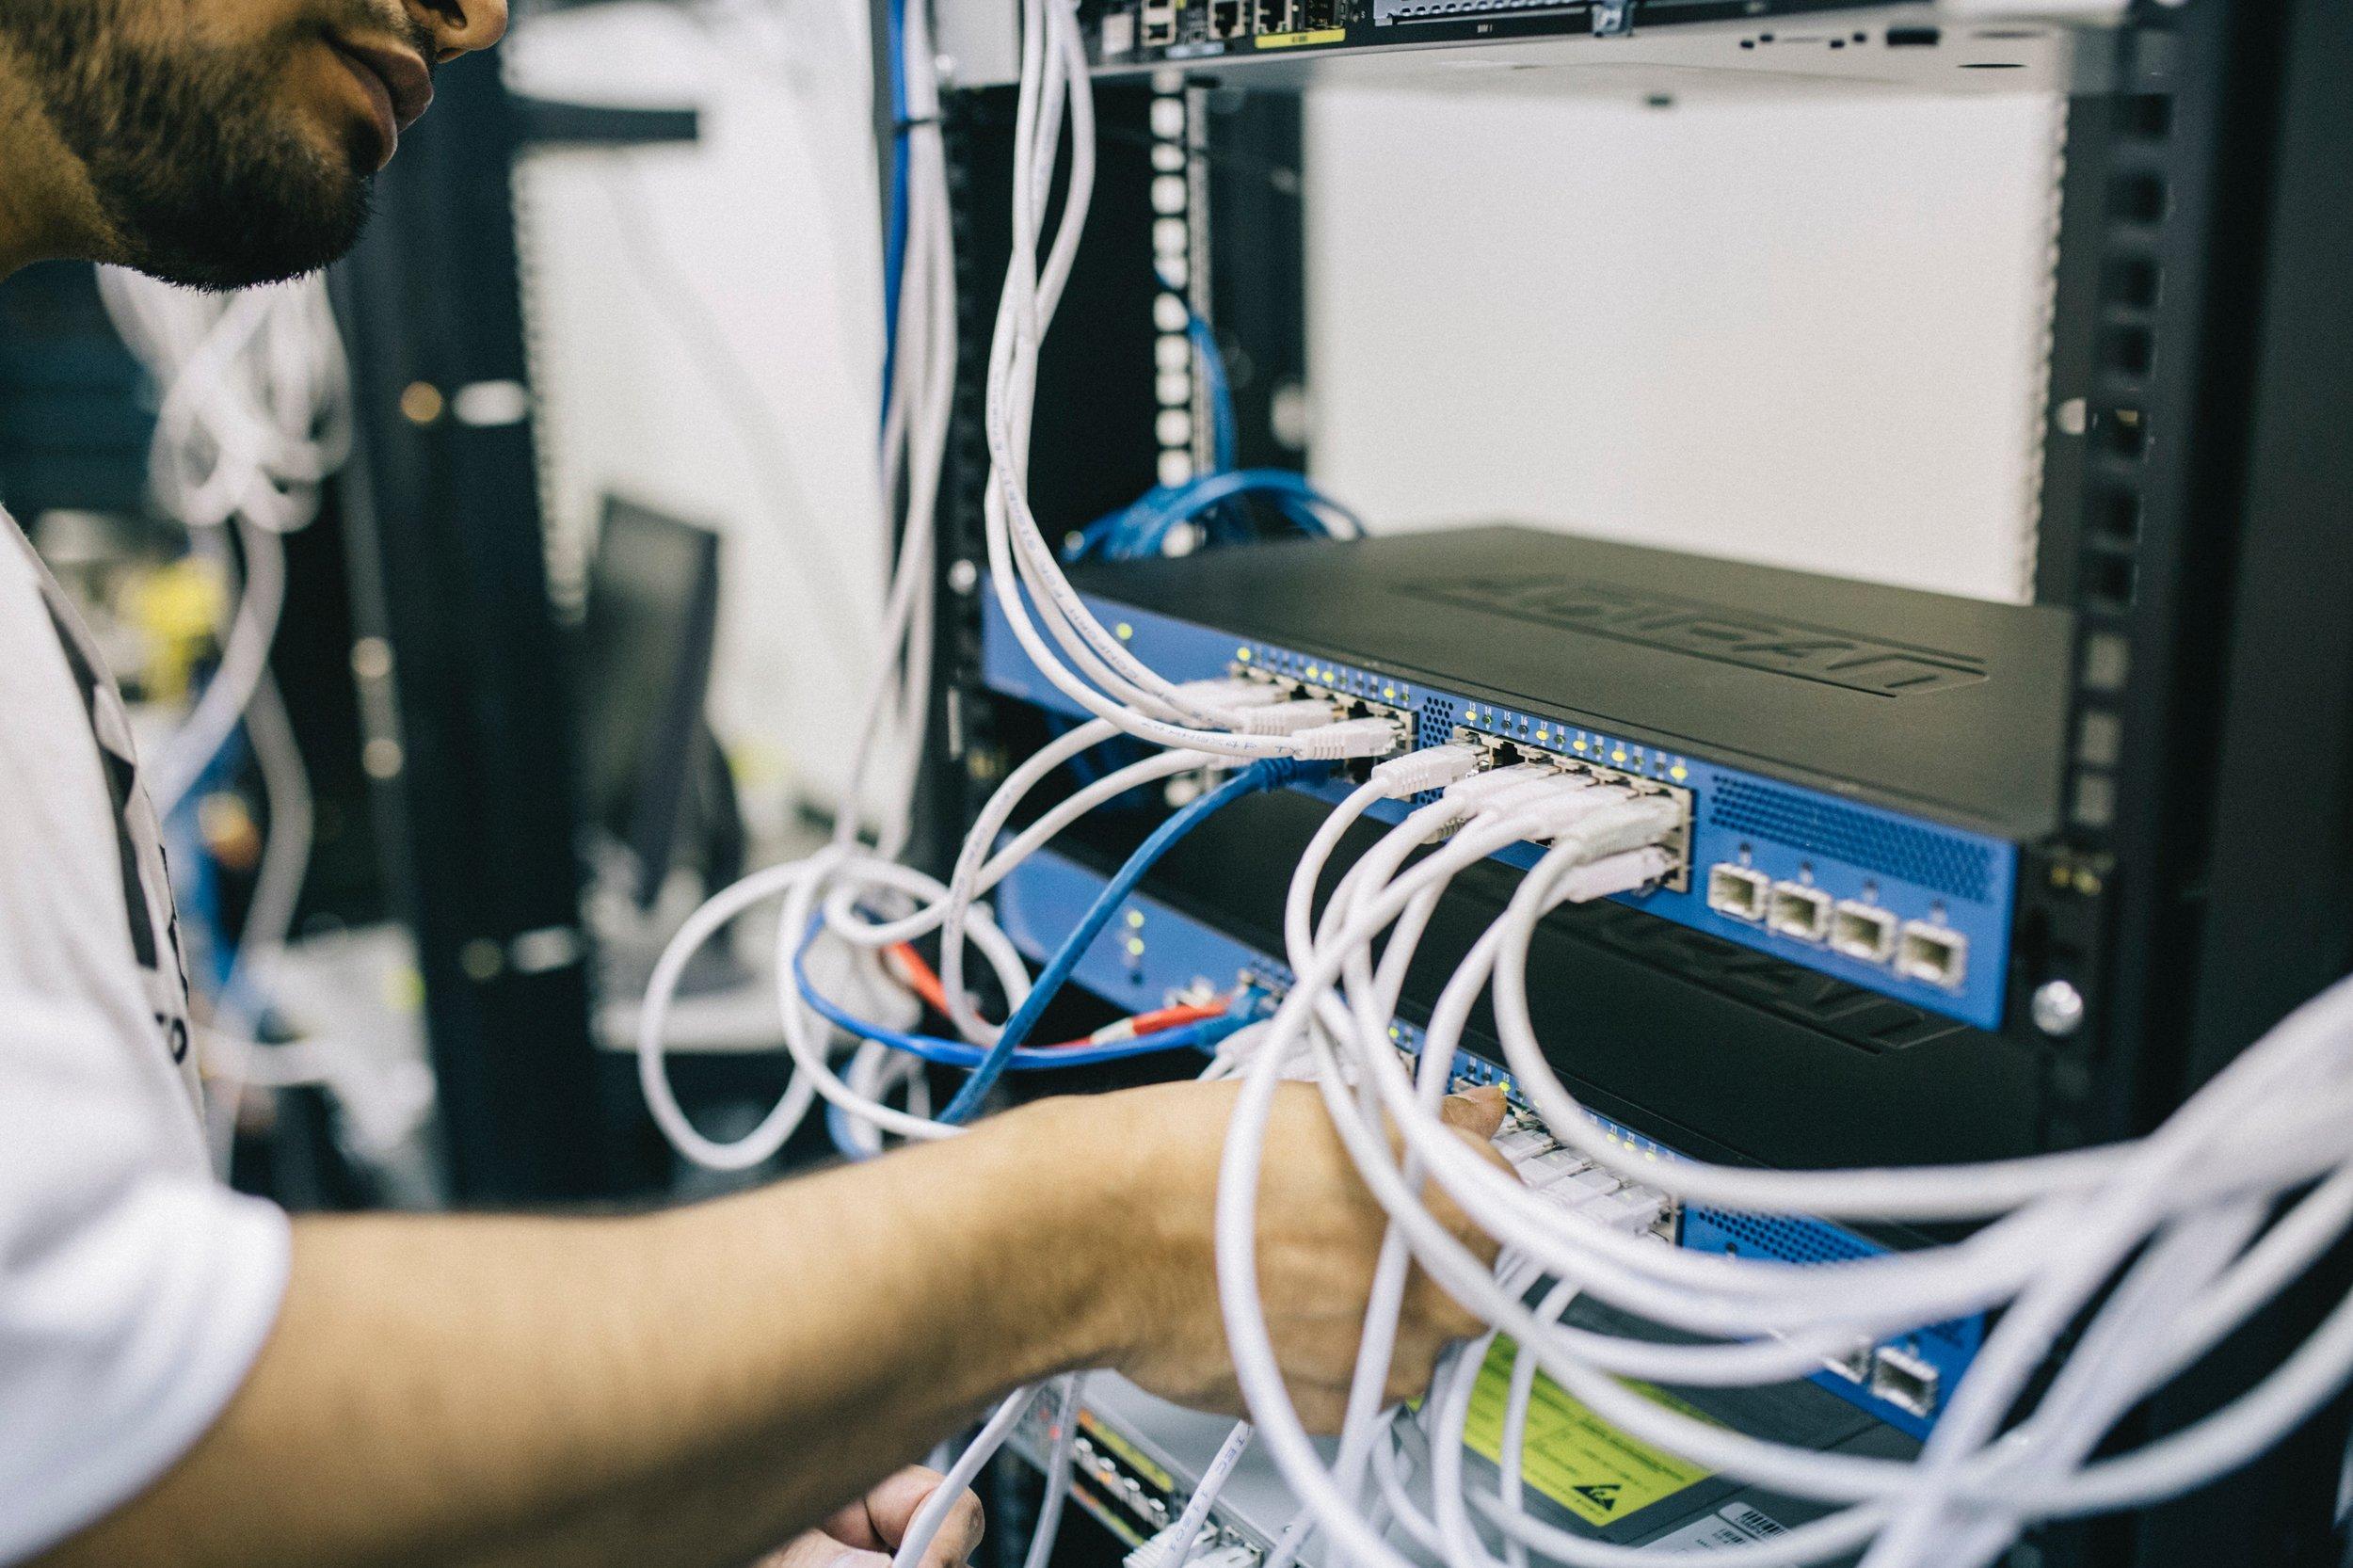 blur-computer-connection-442150.jpg